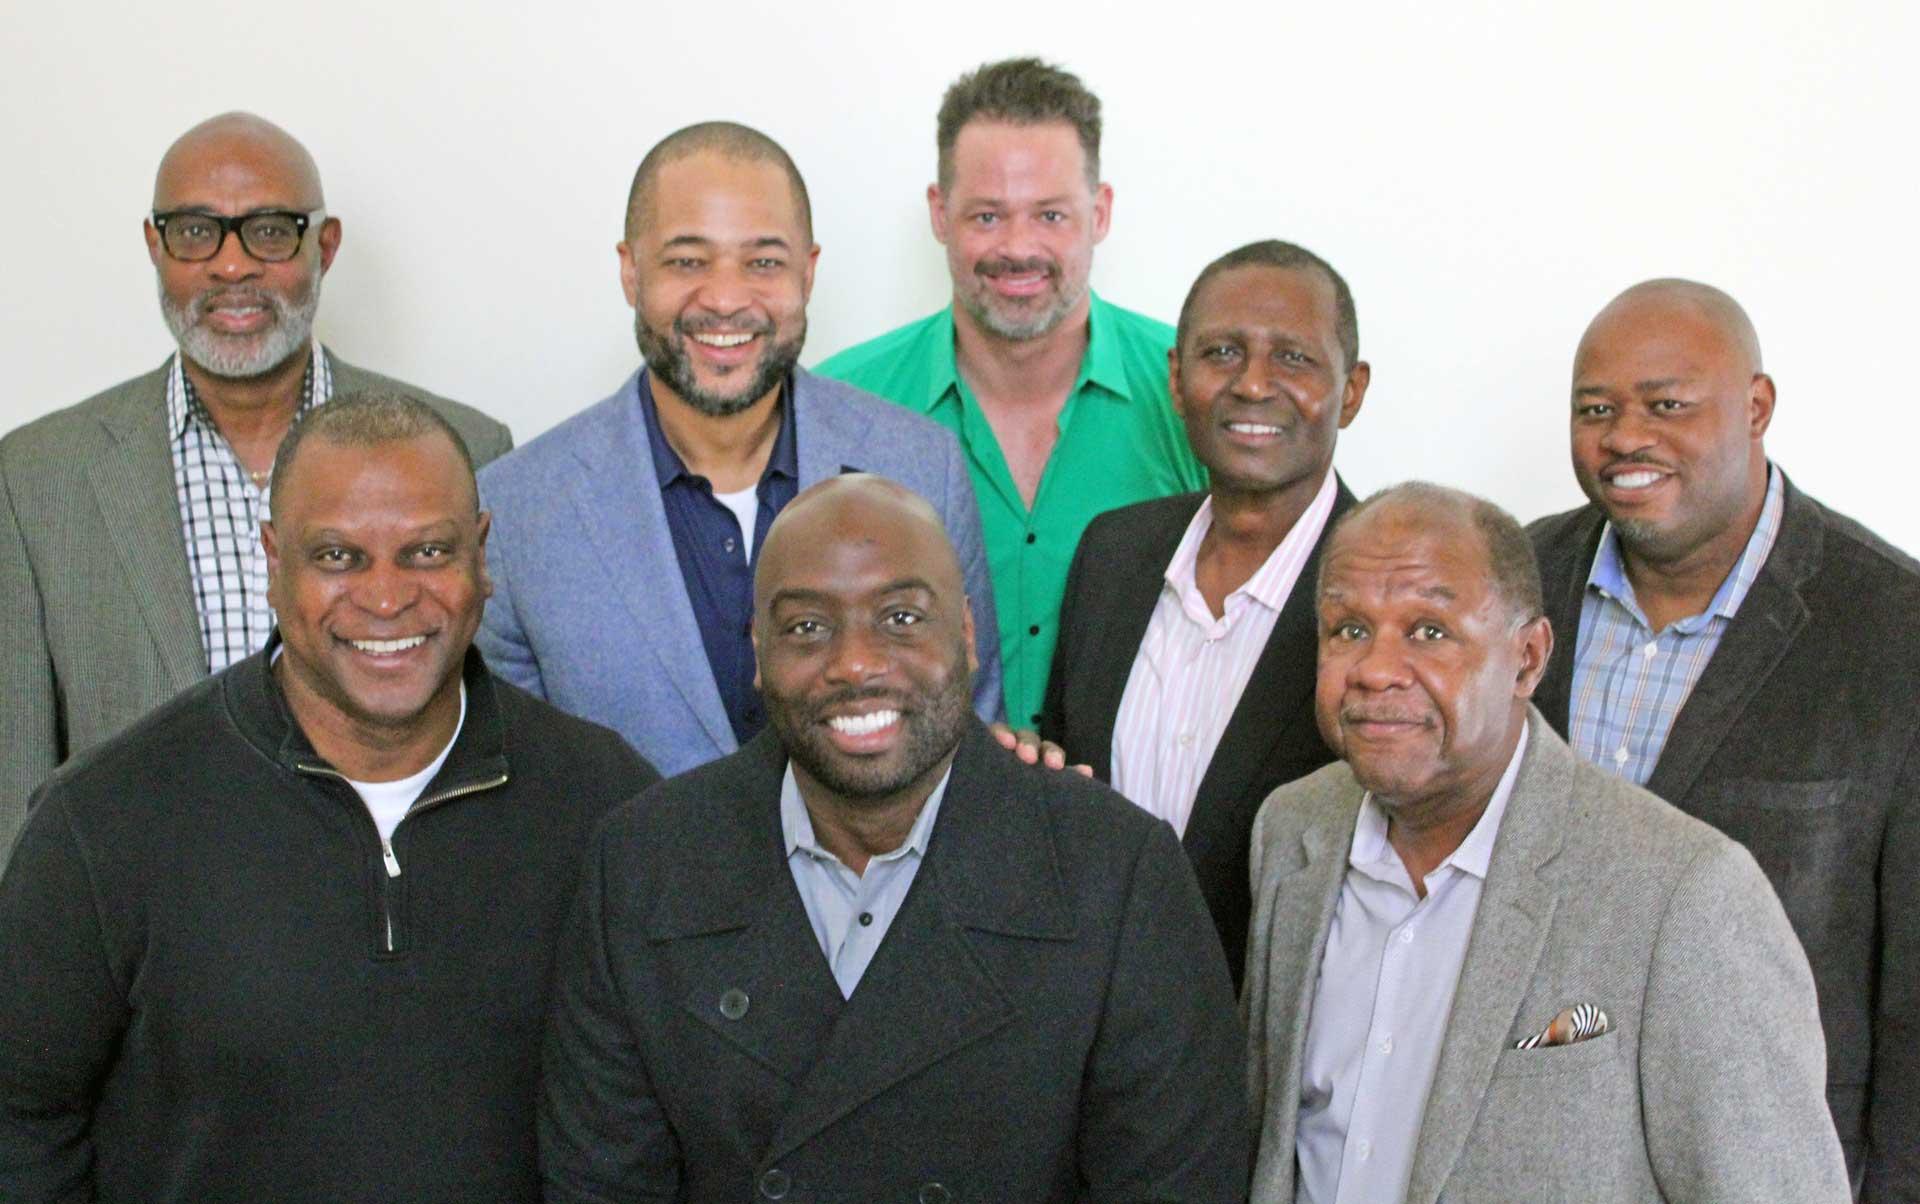 ALCF BOARD OF ELDERS   Front row (left to right): Keith Richardson, Trevor Speech, Carlton Saunders; Middle (L to R): Bryan Loritts, Archelle Funnié, Ezekiel Harvey; Back (L to R): Rocky Bridges, Glenn Posein